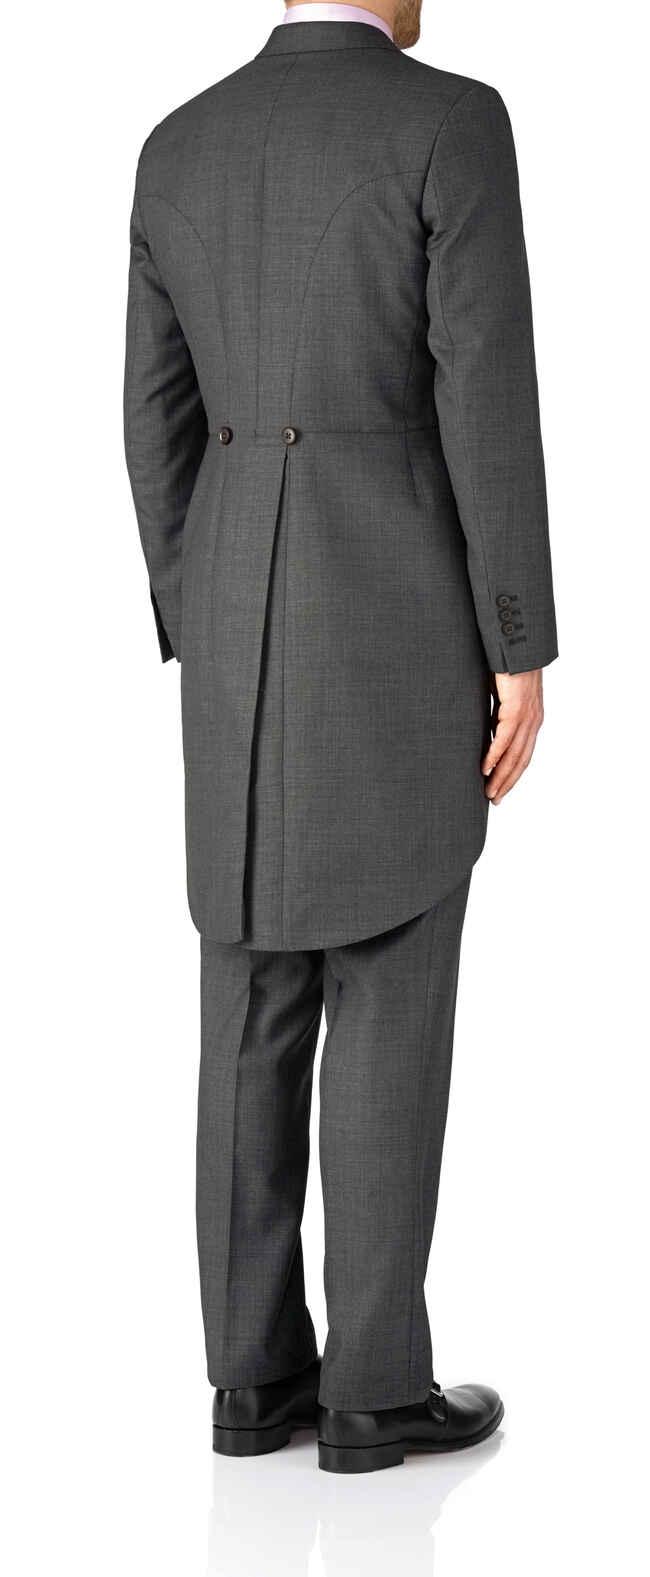 Dark grey classic fit morning suit